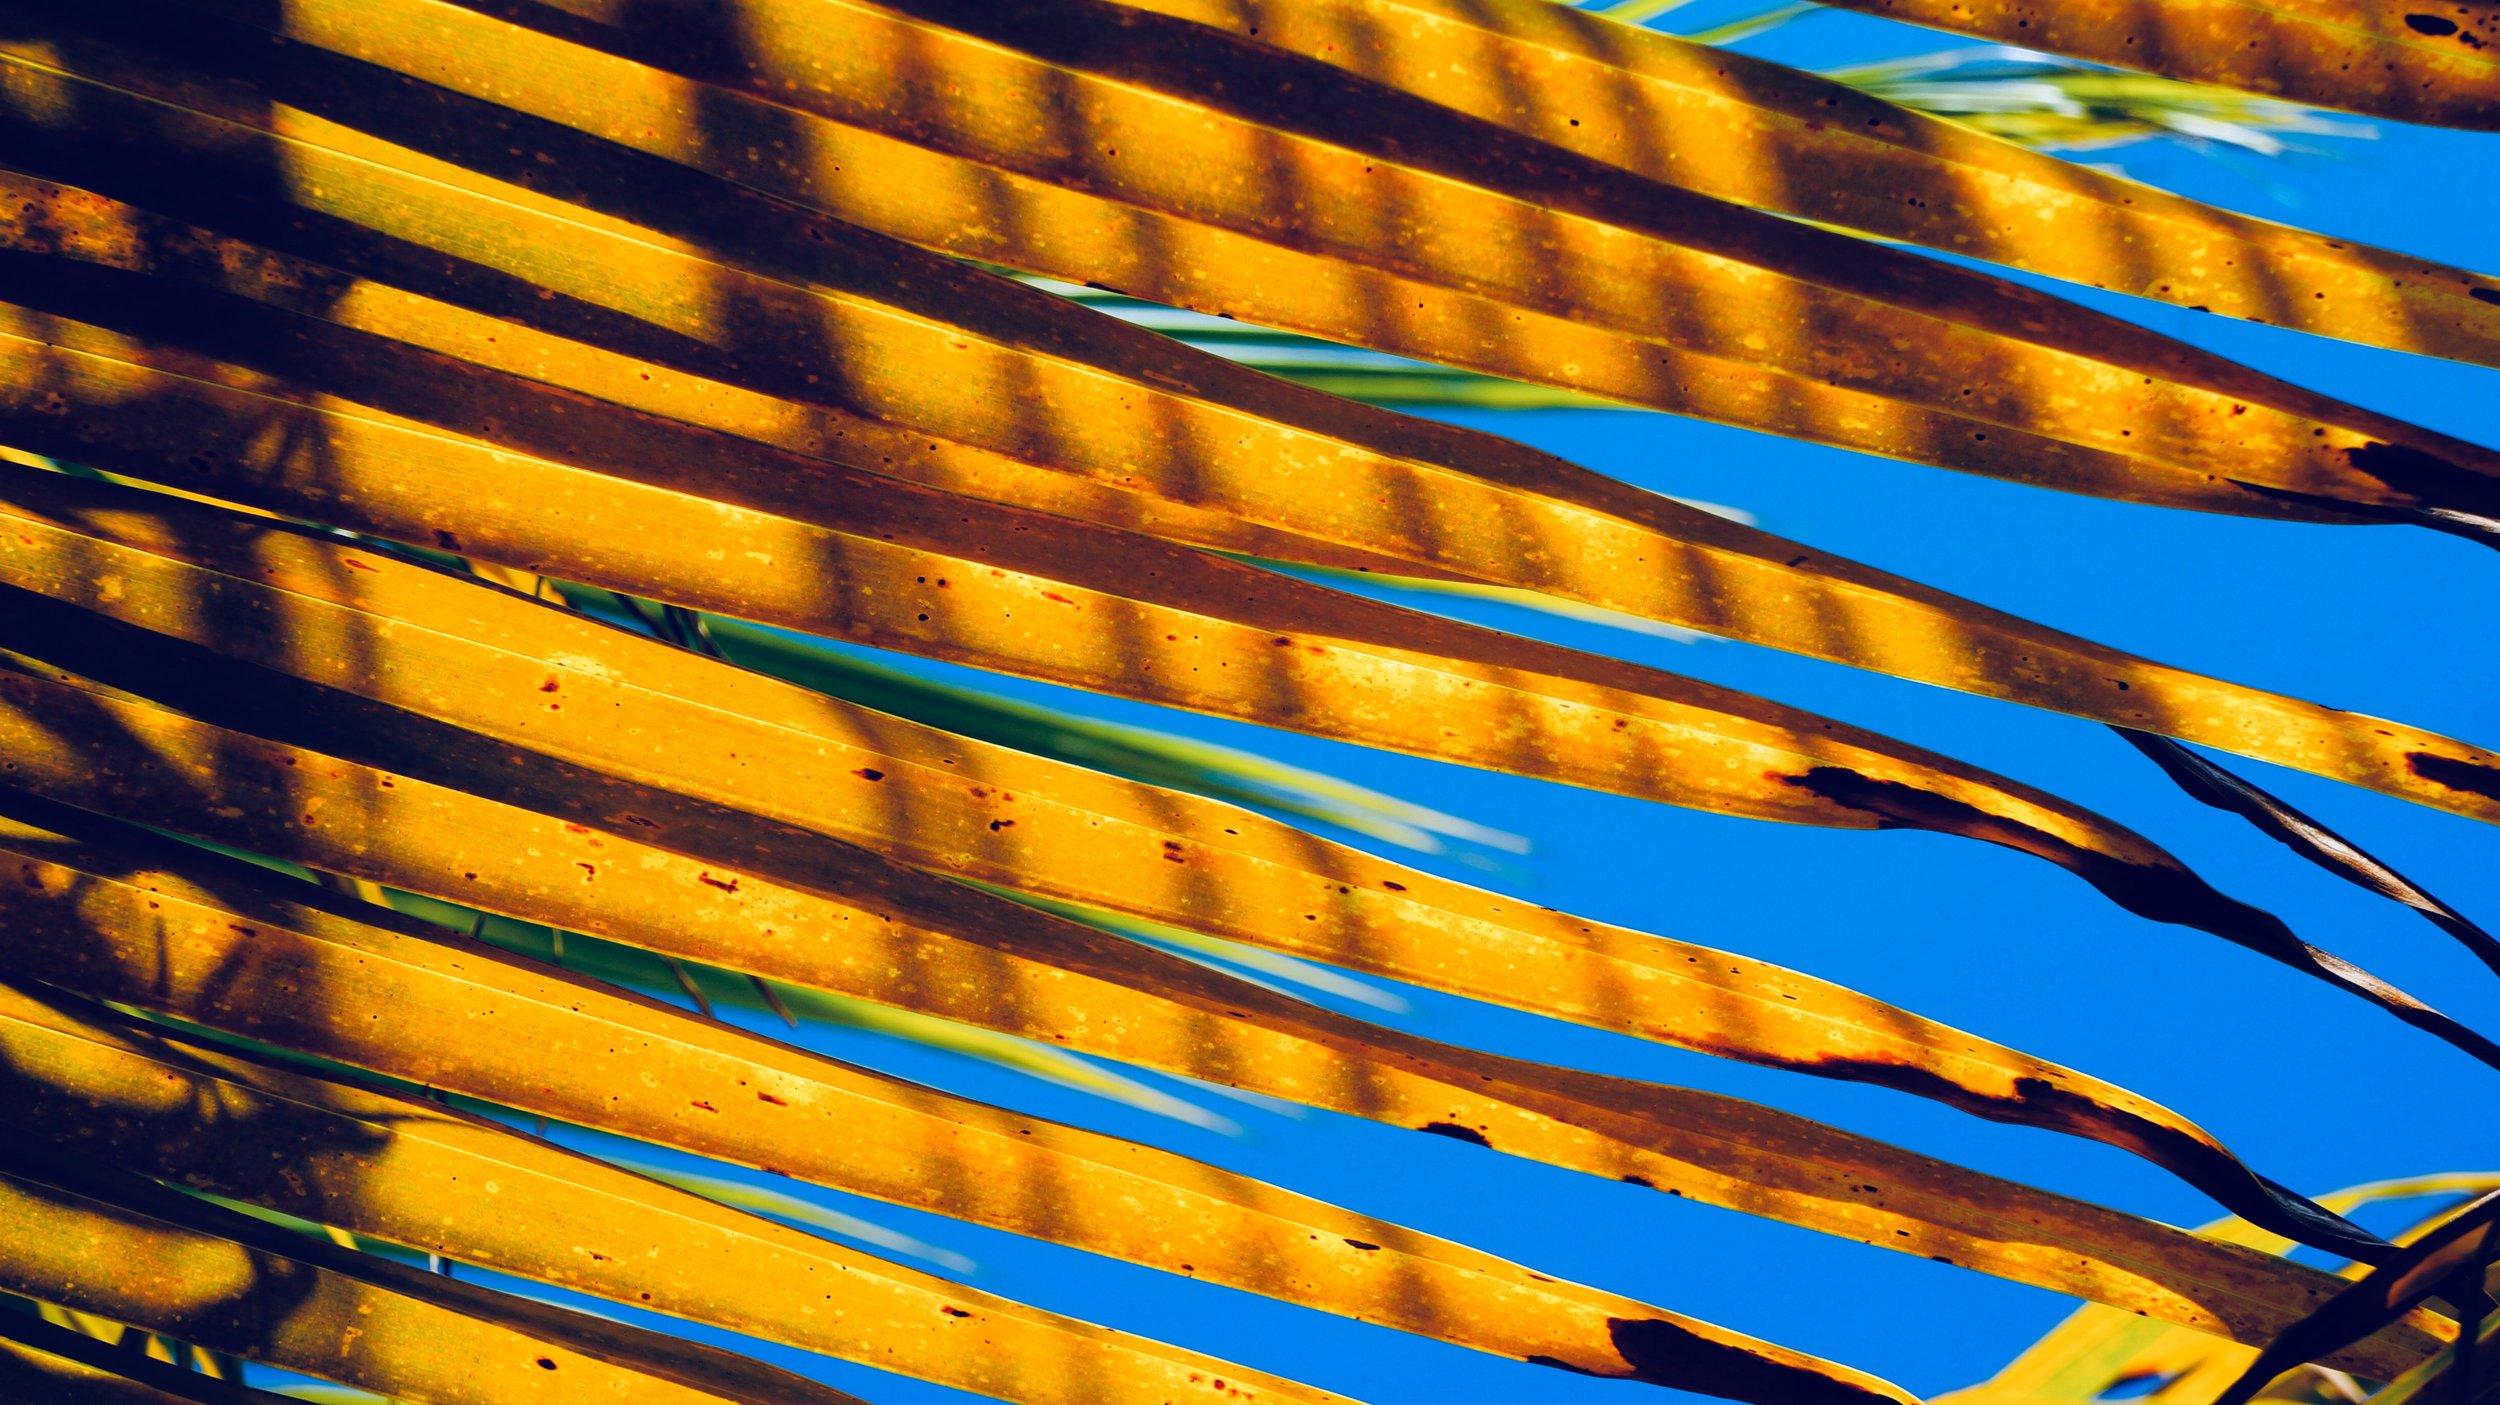 Honduras bailey-hall-709449-unsplash.jpg